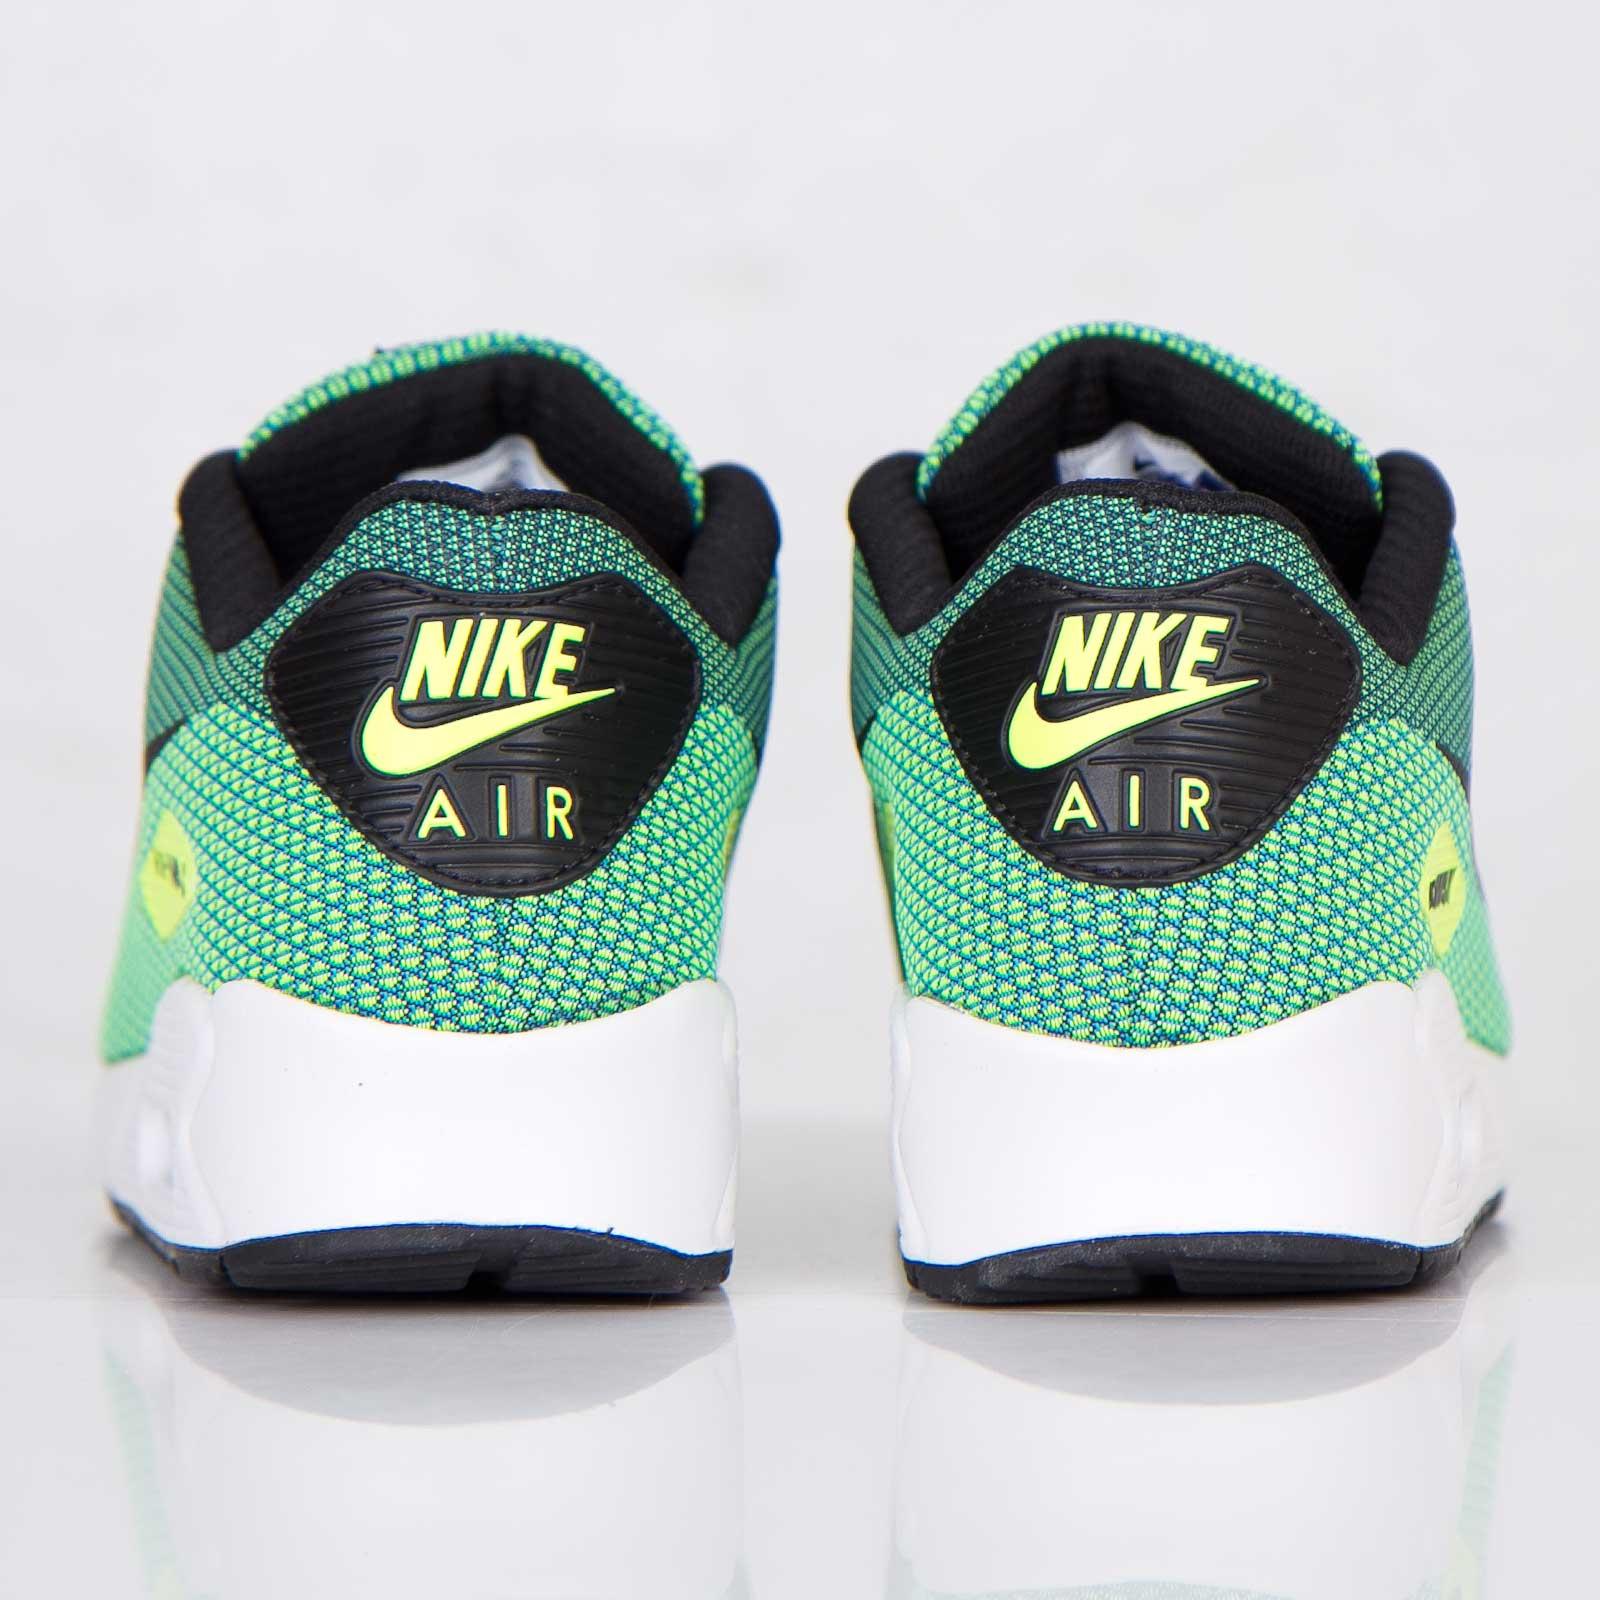 662effdcc6 Nike Air Max 90 JCRD - 631750-300 - Sneakersnstuff   sneakers & streetwear  online since 1999